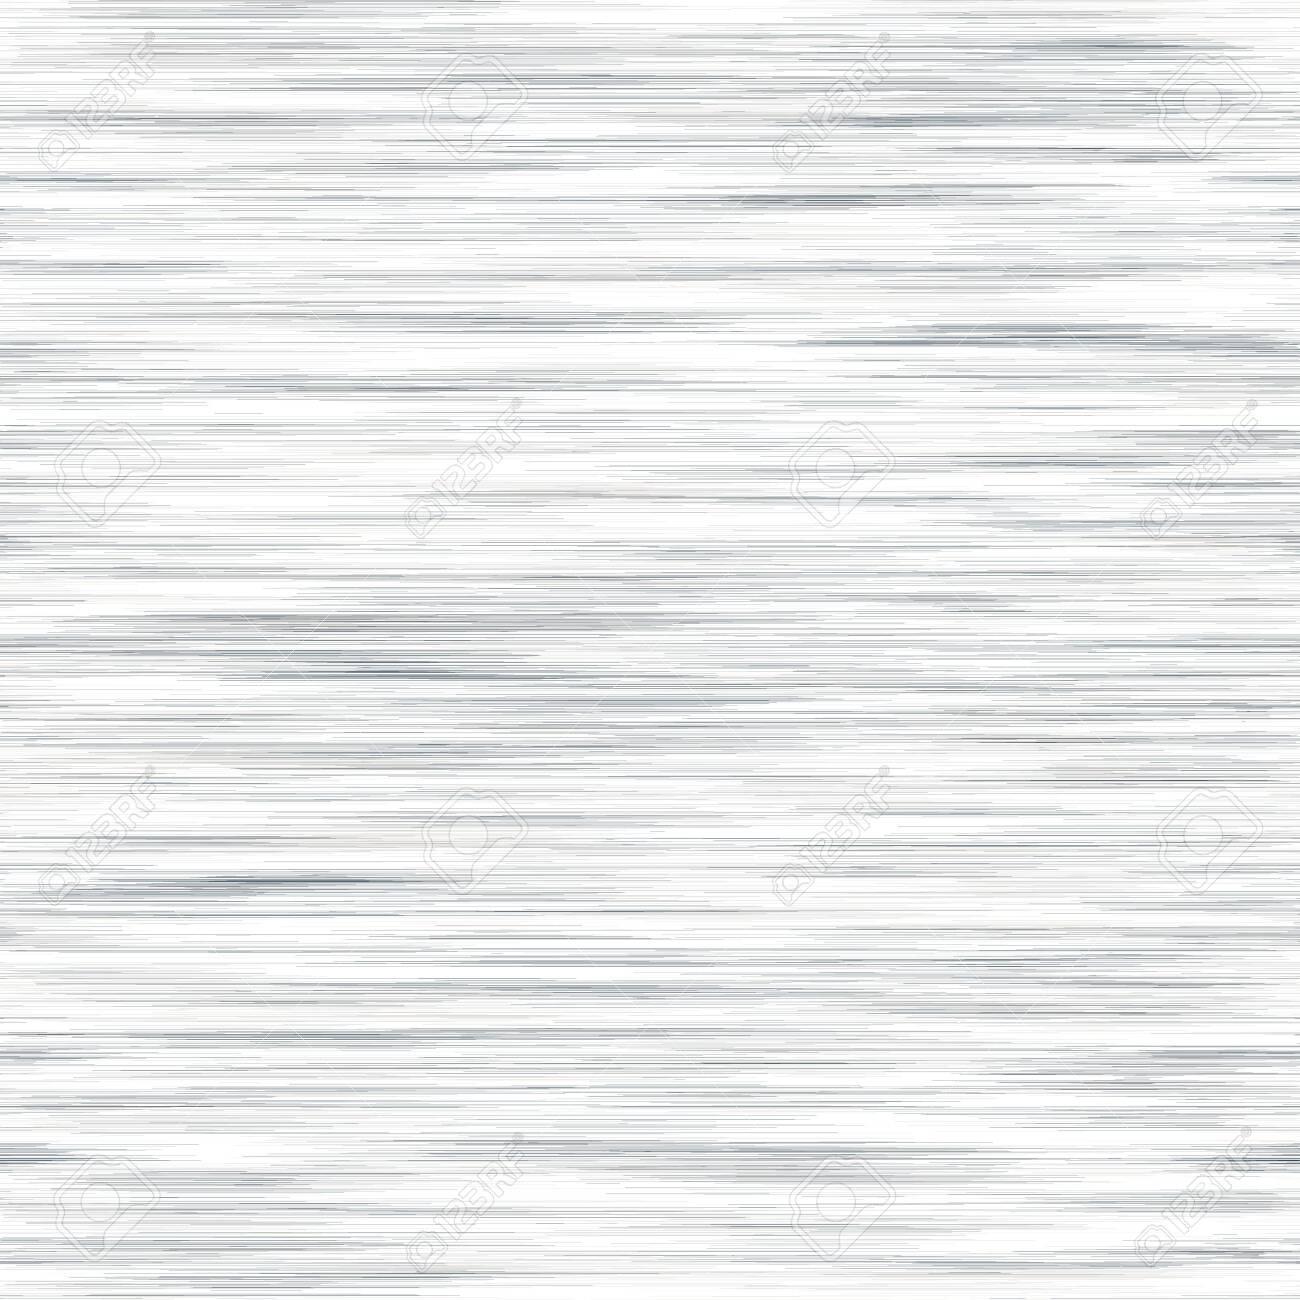 Gray Marl Heather Melange Seamless Vector Pattern - 133199509